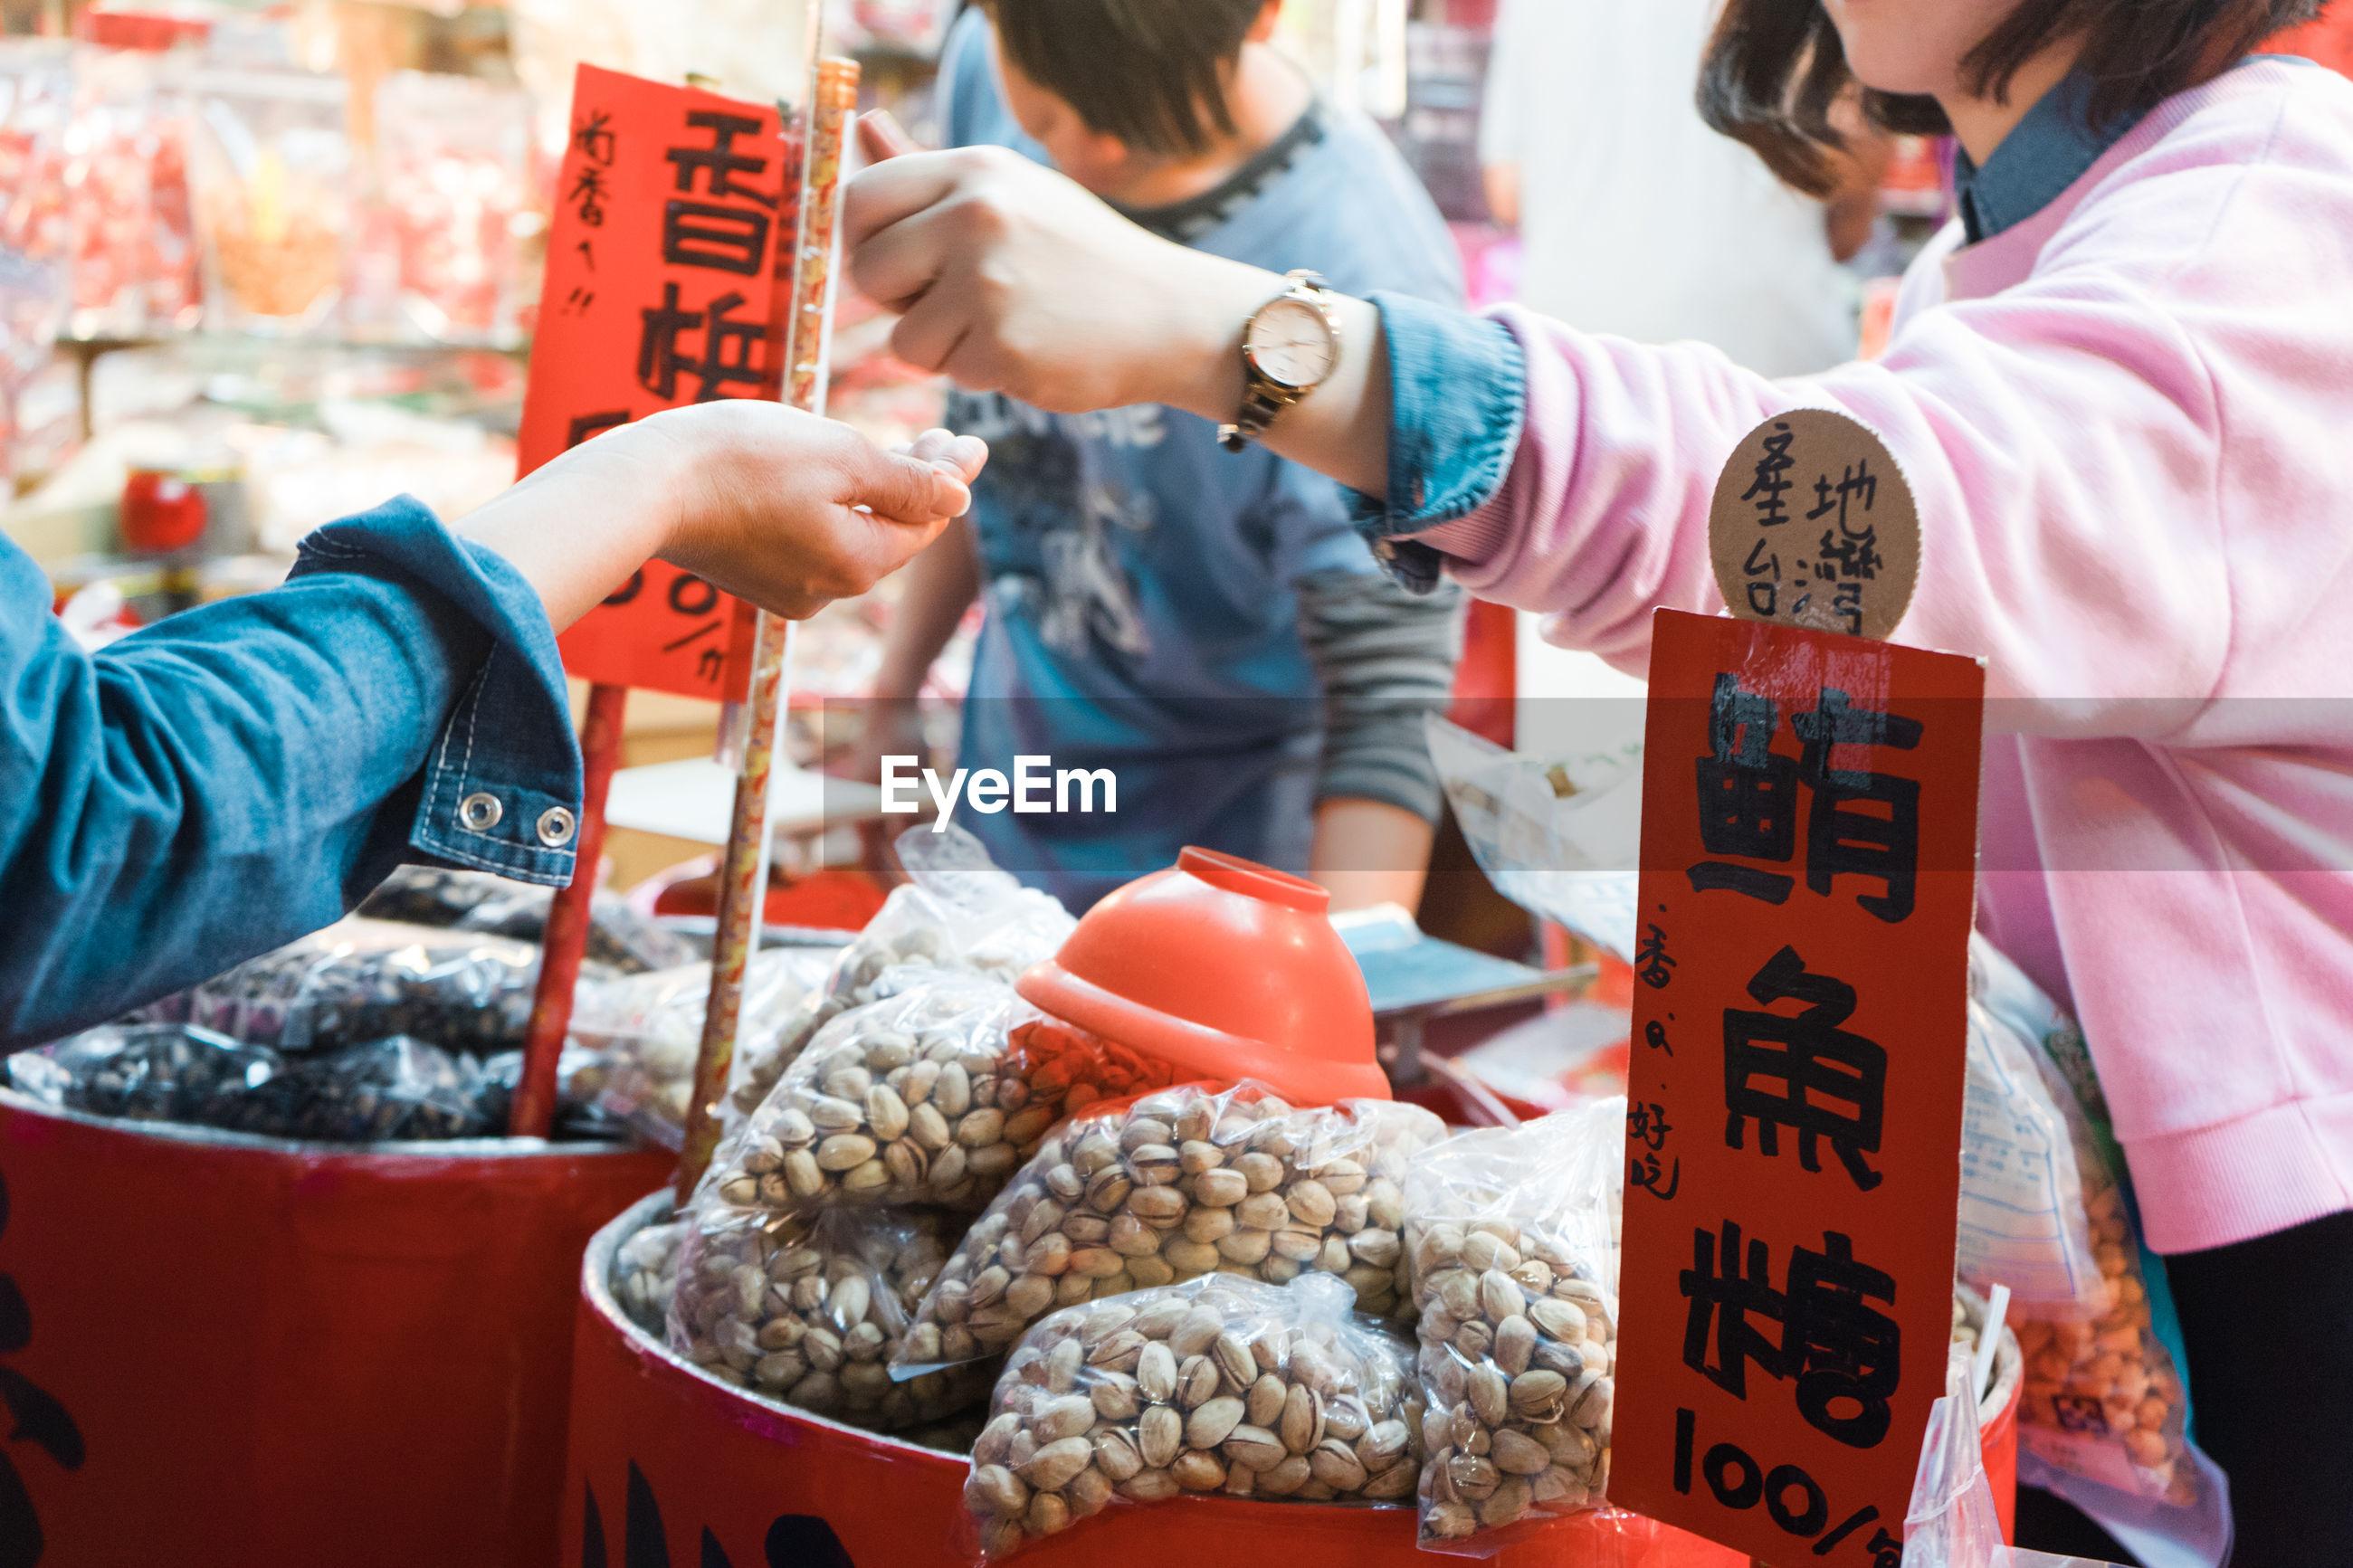 Woman buying pistachio from market vendor